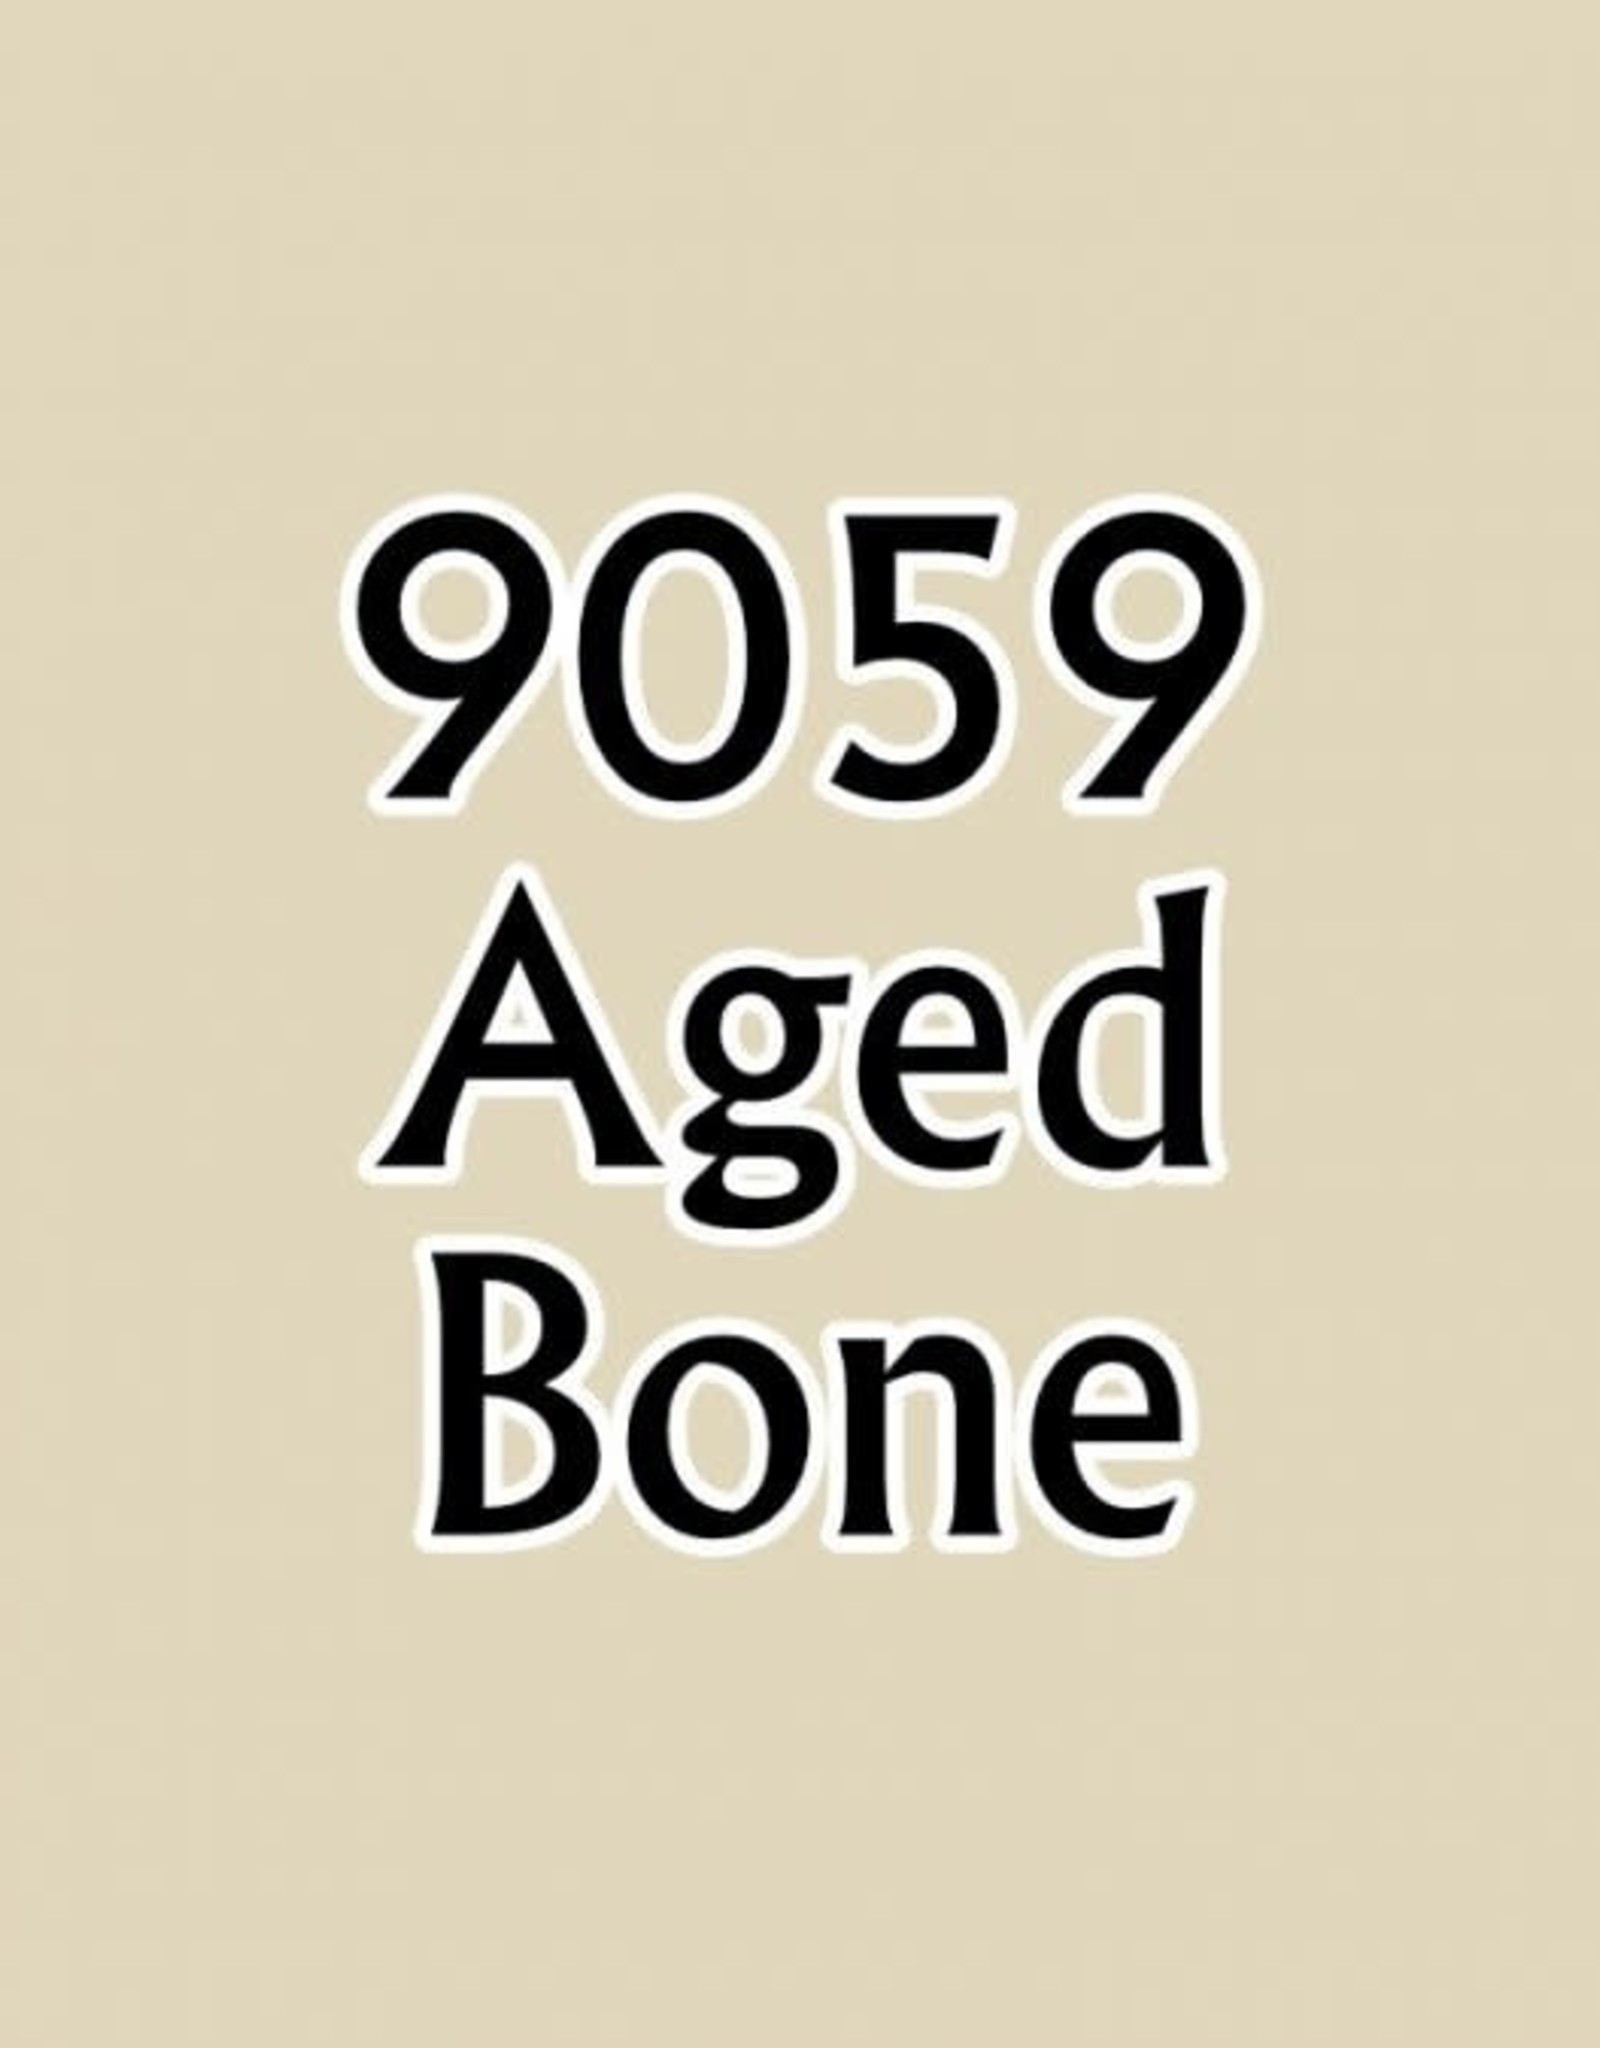 Reaper Aged Bone